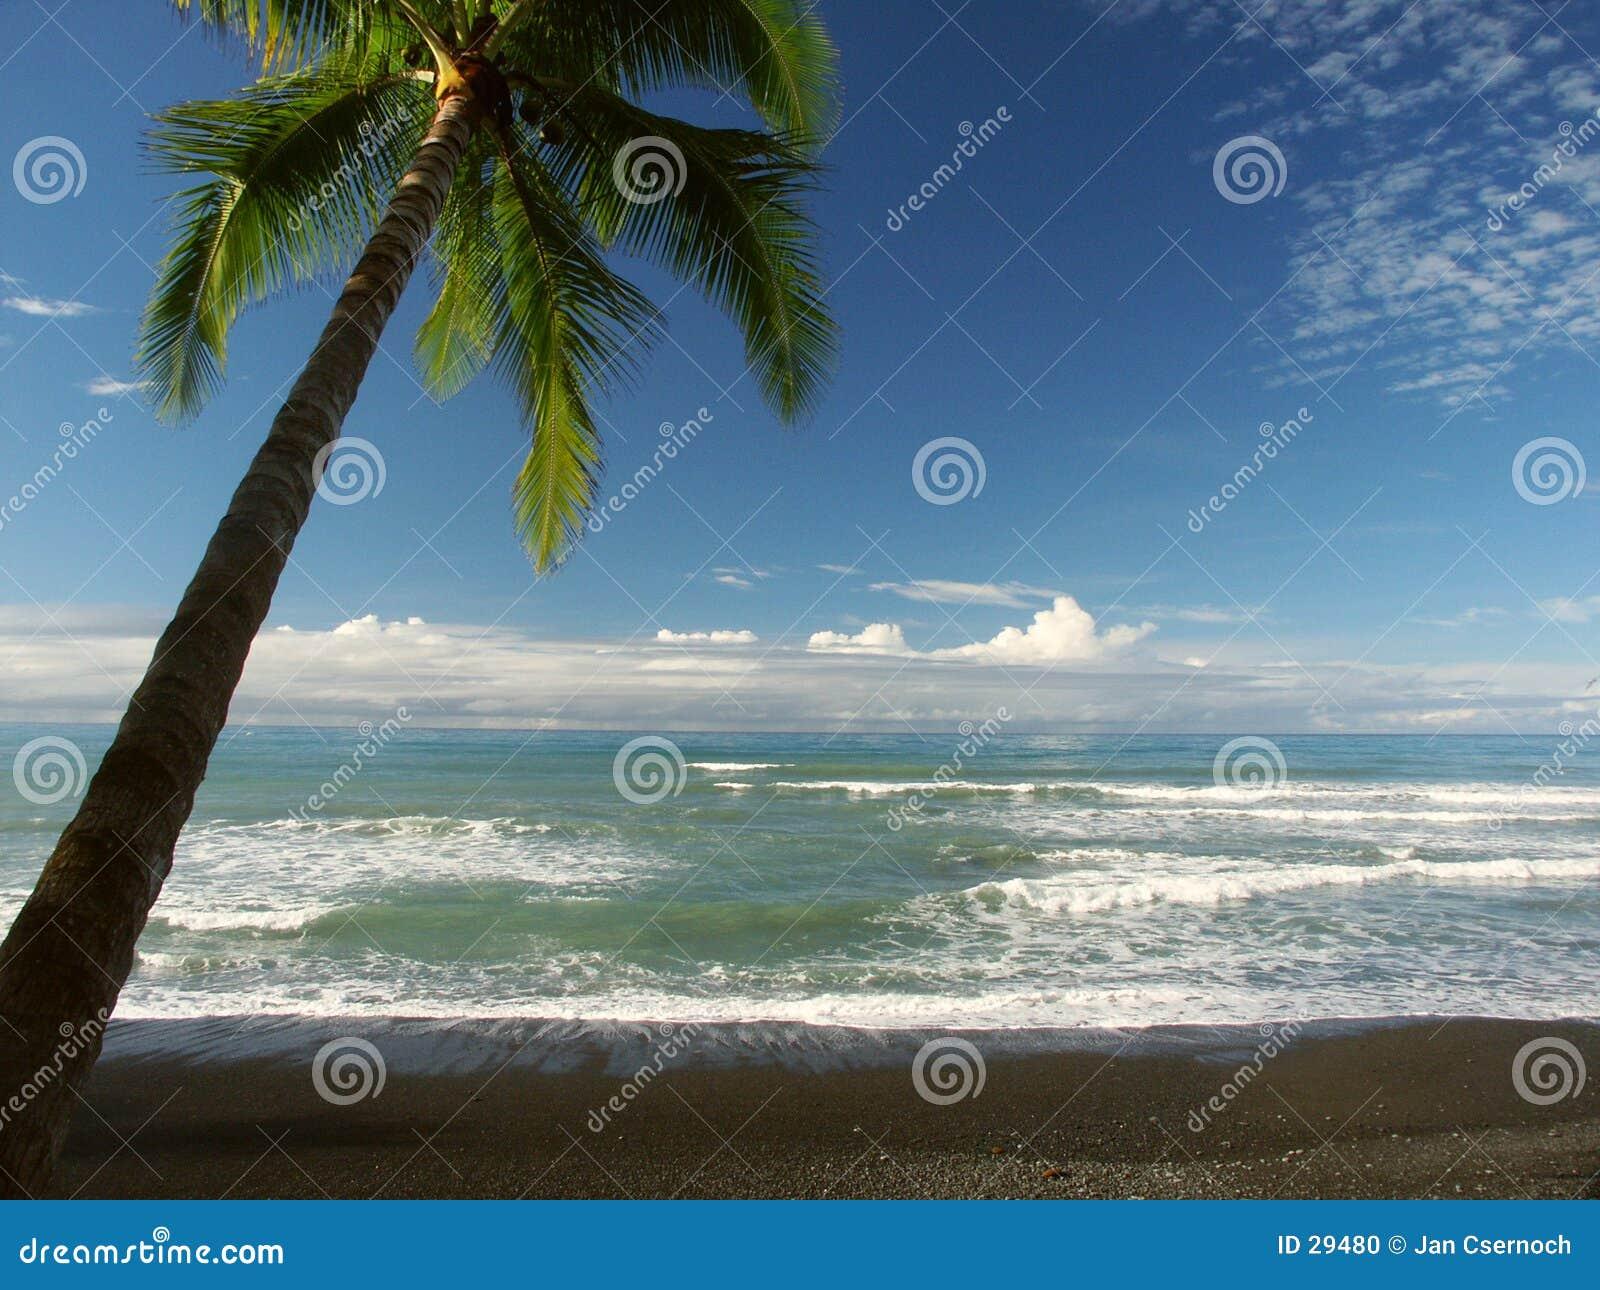 Download Seaview con palmtree foto de archivo. Imagen de horizonte - 29480